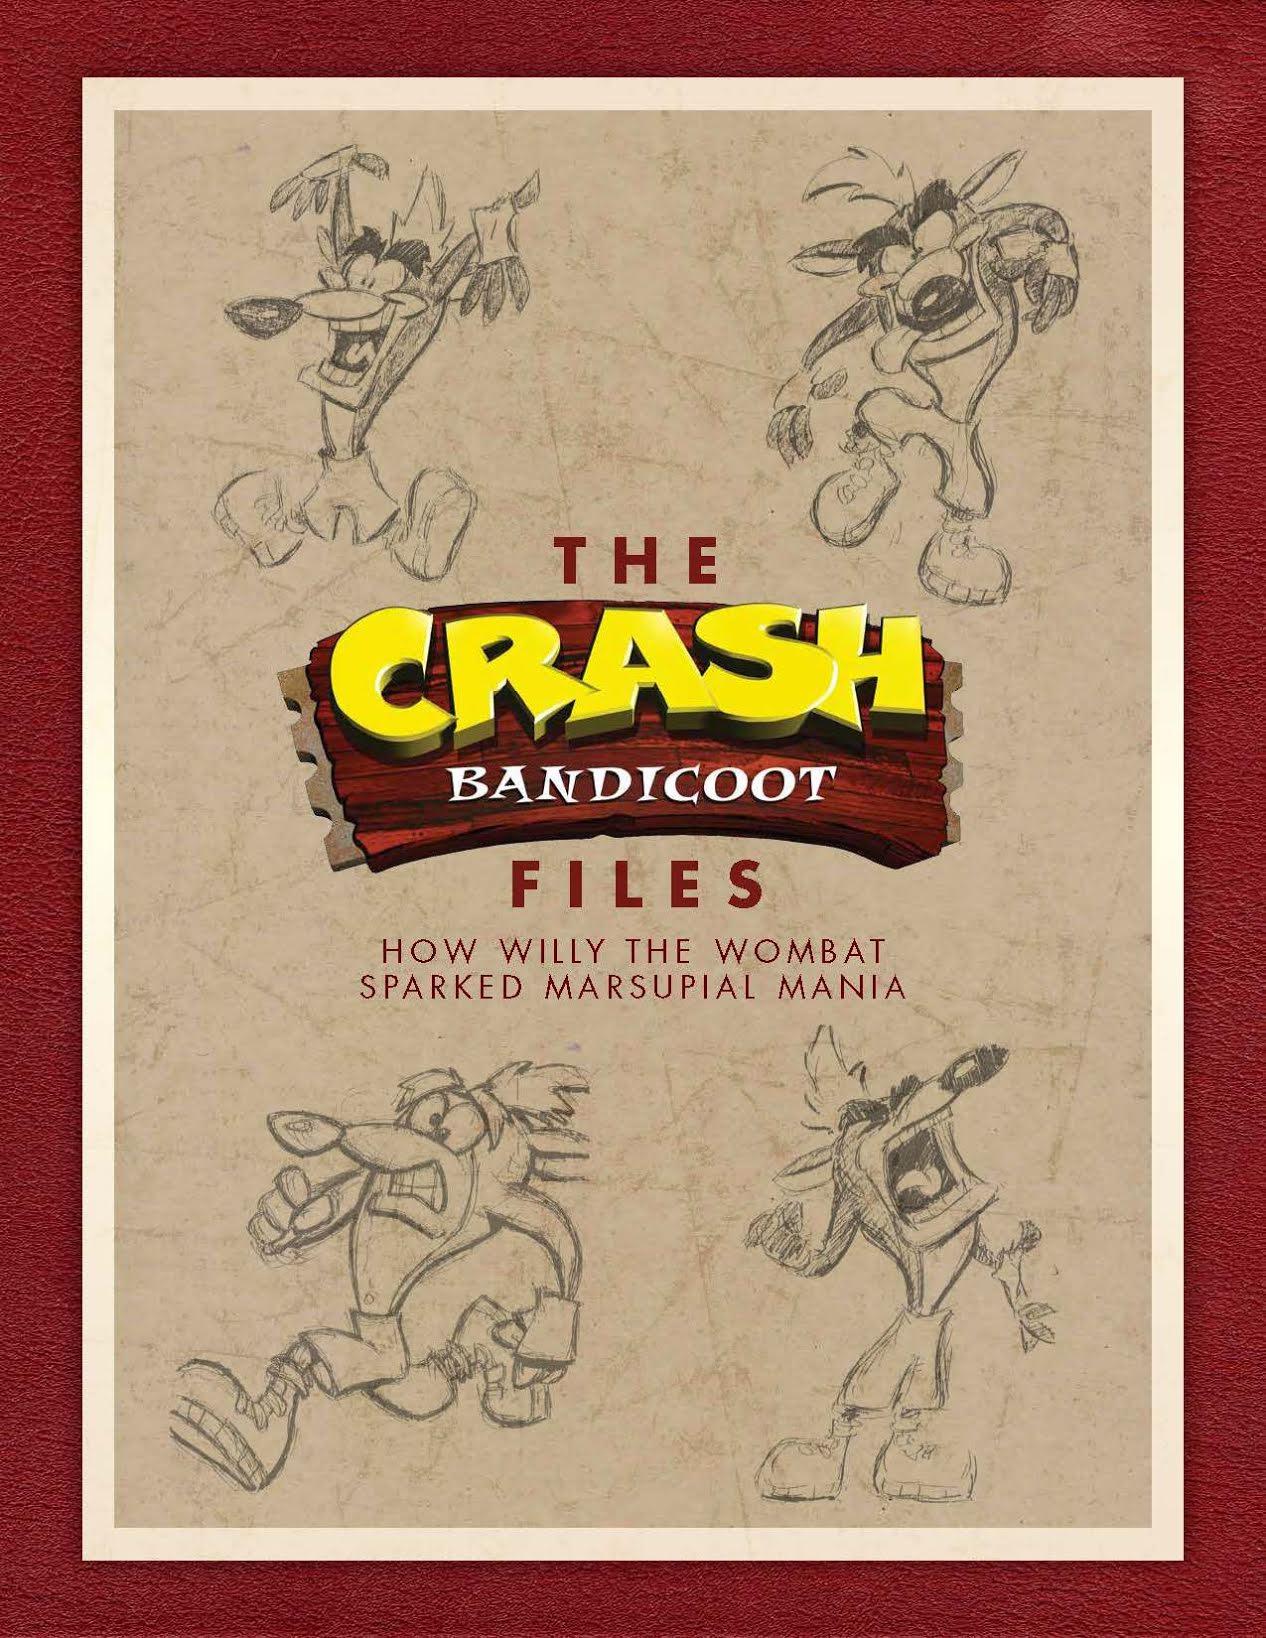 crash bandicoot files cover - Trwają prace nad artbookiem The Crash Bandicoot Files!